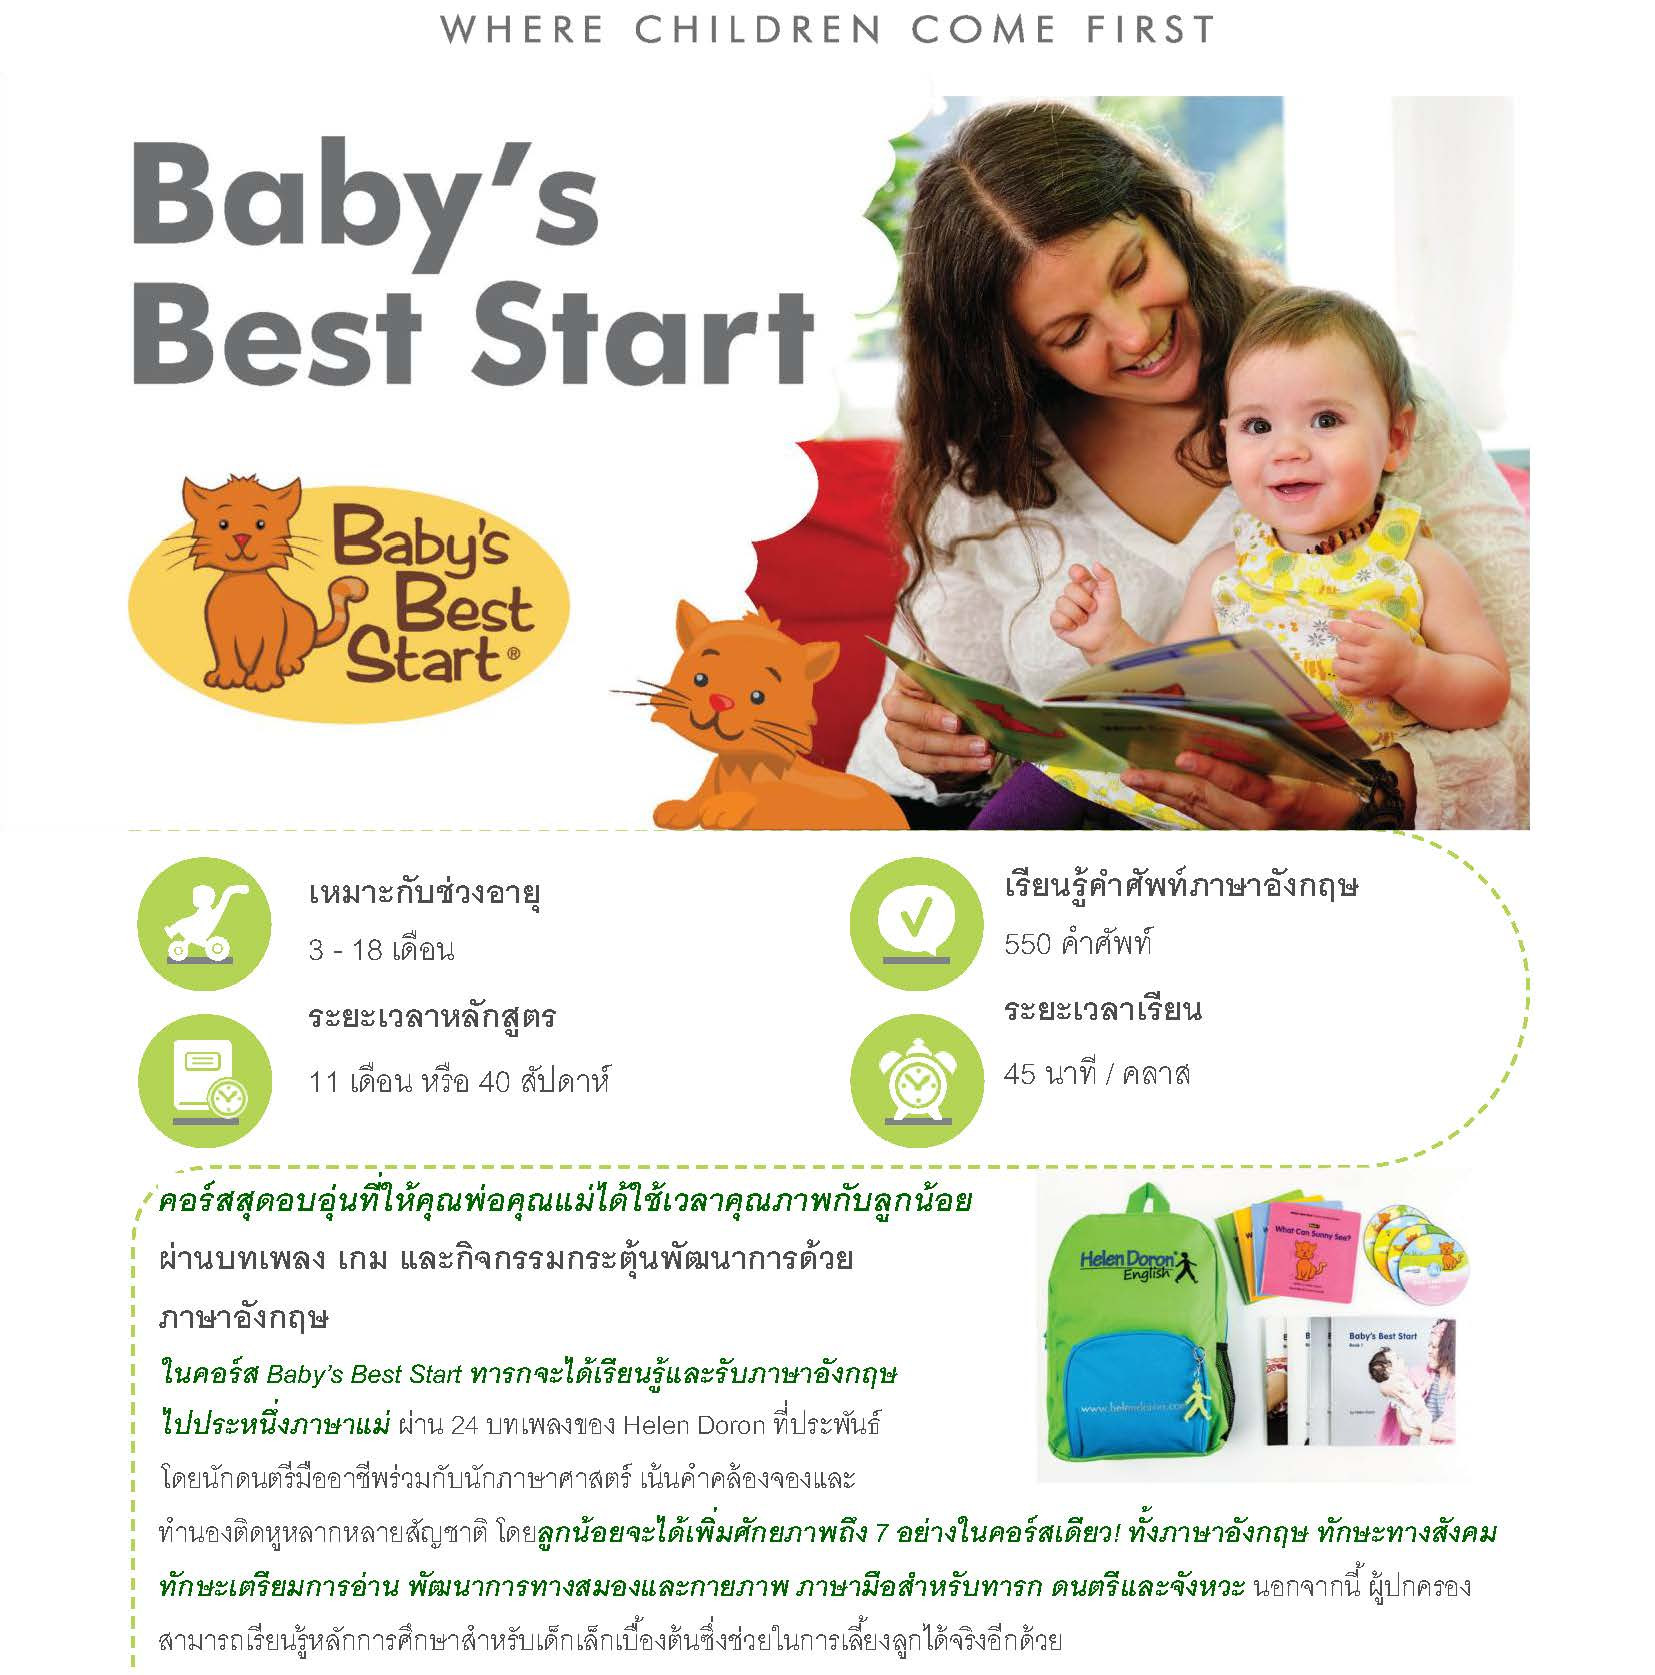 Download - Baby's Best Start ปูพื้นฐานการพูดภาษาอังกฤษผ่านกิจกรรมเสริมพัฒนาการด้านต่าง ๆ เพลง และบทกลอนคล้องจอง